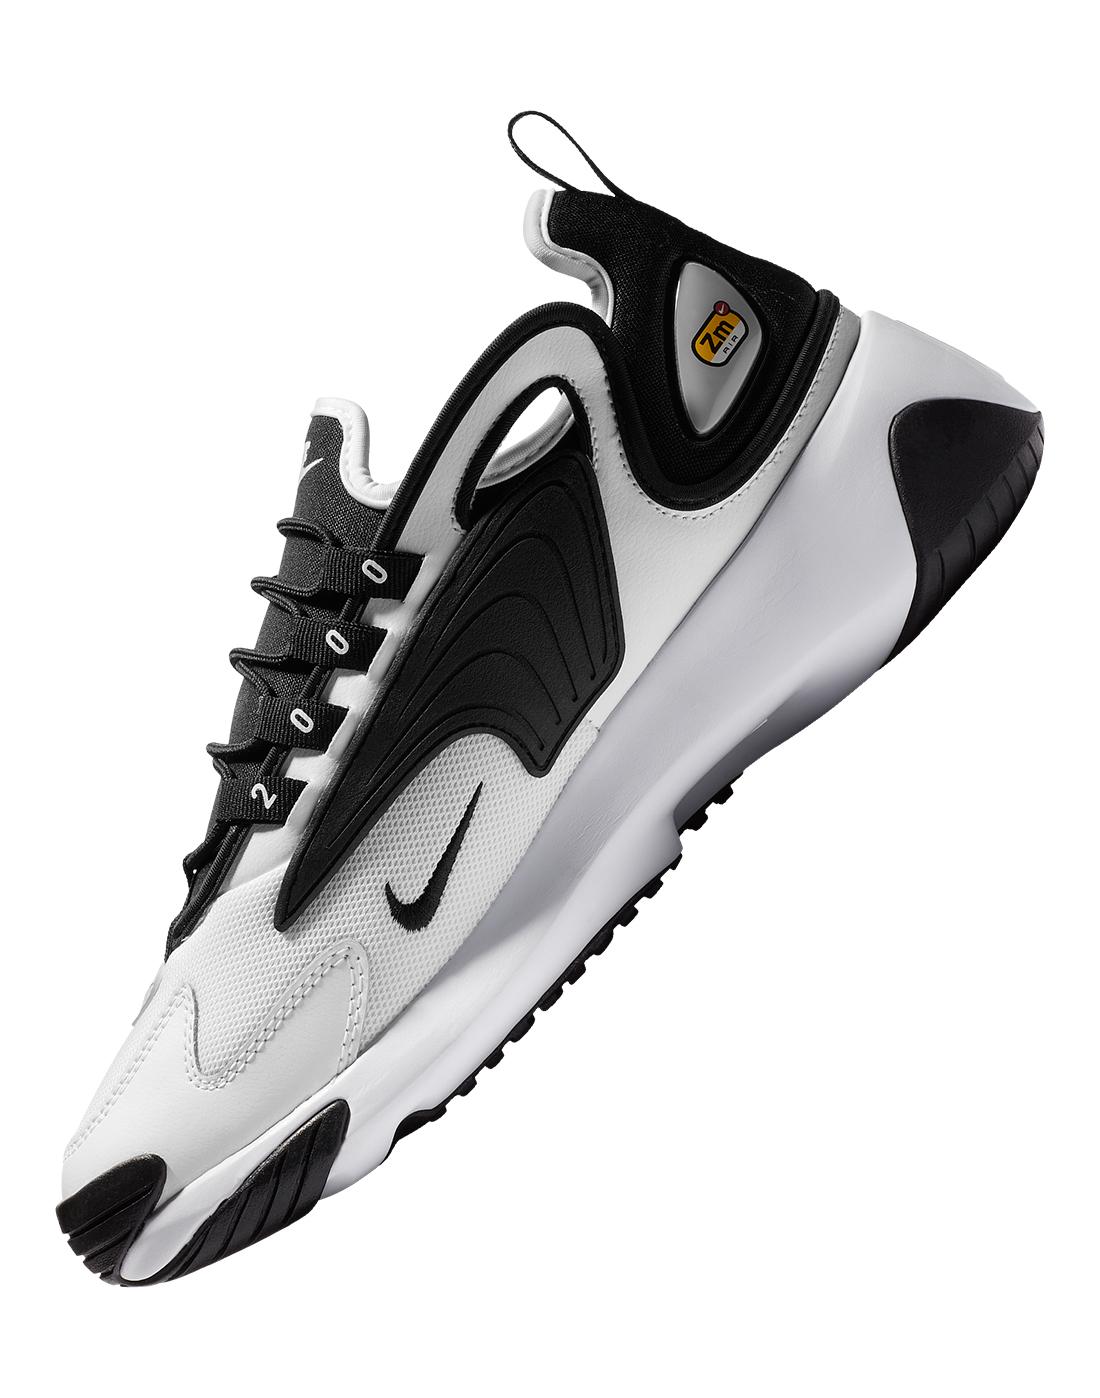 d93a7653c12 Men's White & Black Nike Zoom 2K | Life style Sports